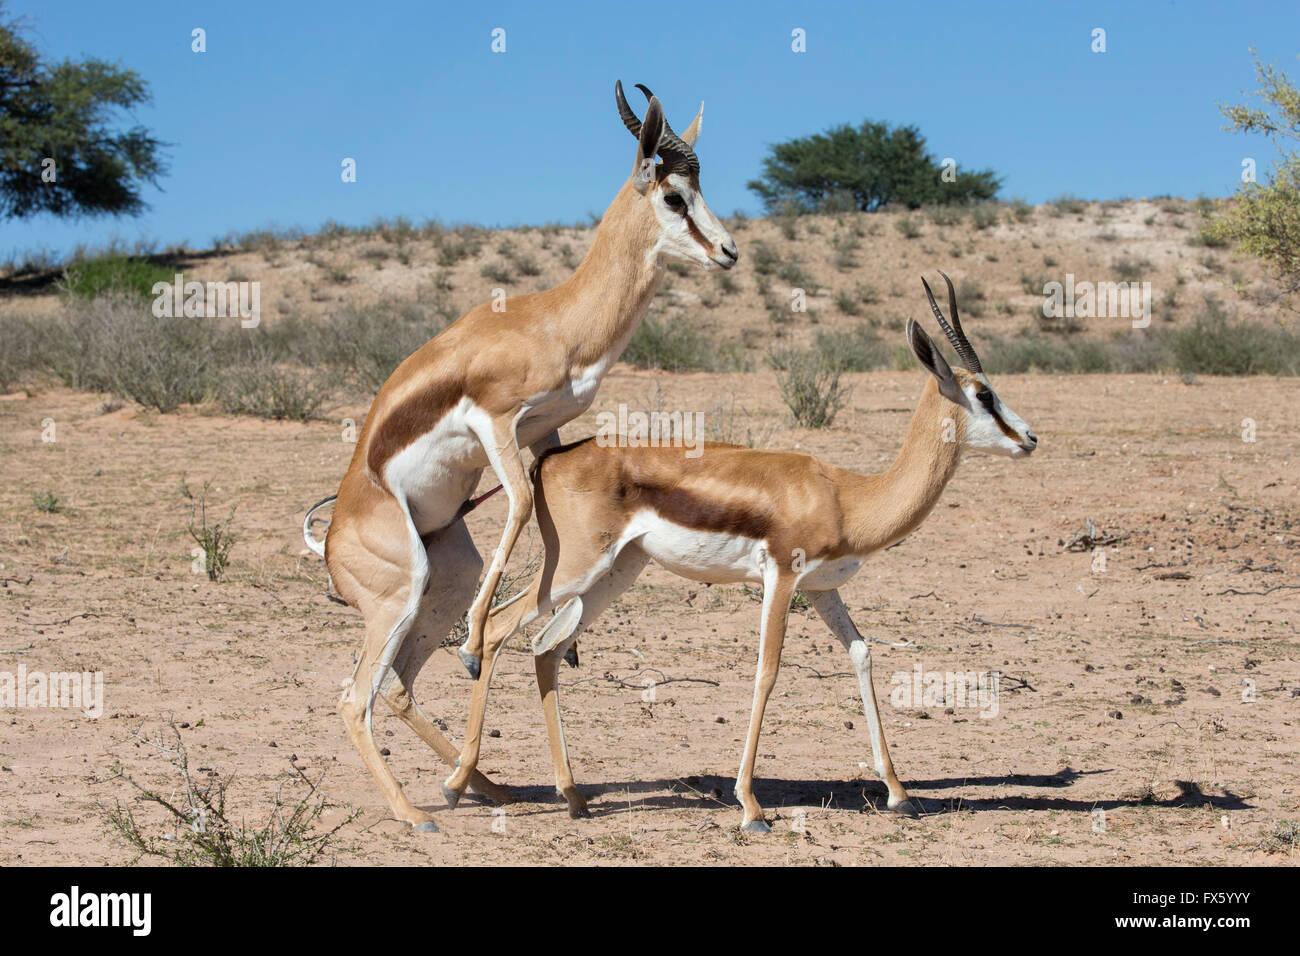 Springbok (Antidorcas marsupialis) mating, Kgalagadi Transfrontier Park, South Africa - Stock Image